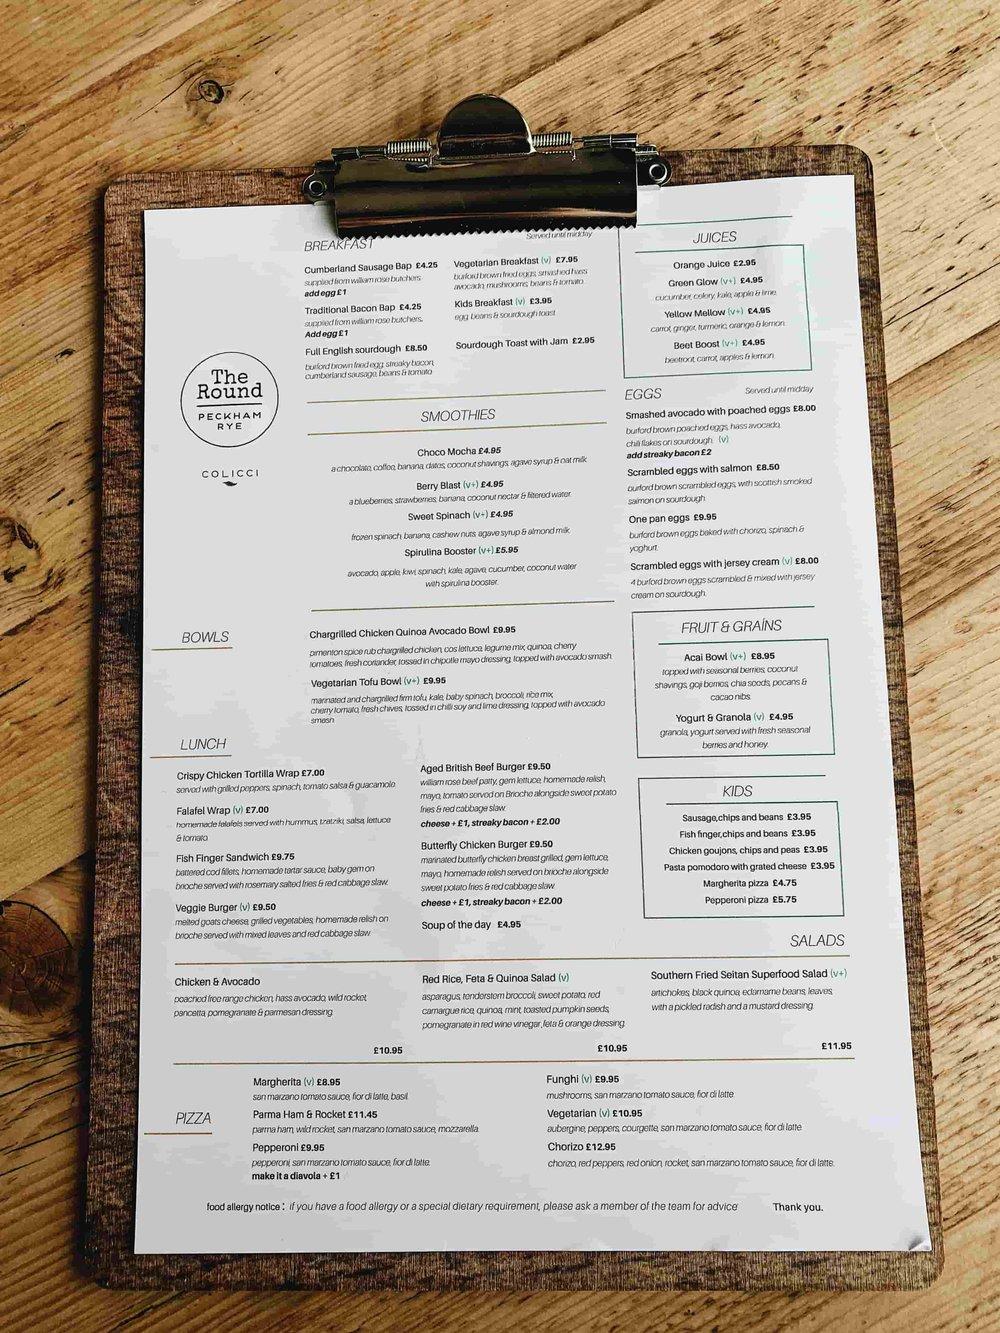 Peckham Rye Cafe menu